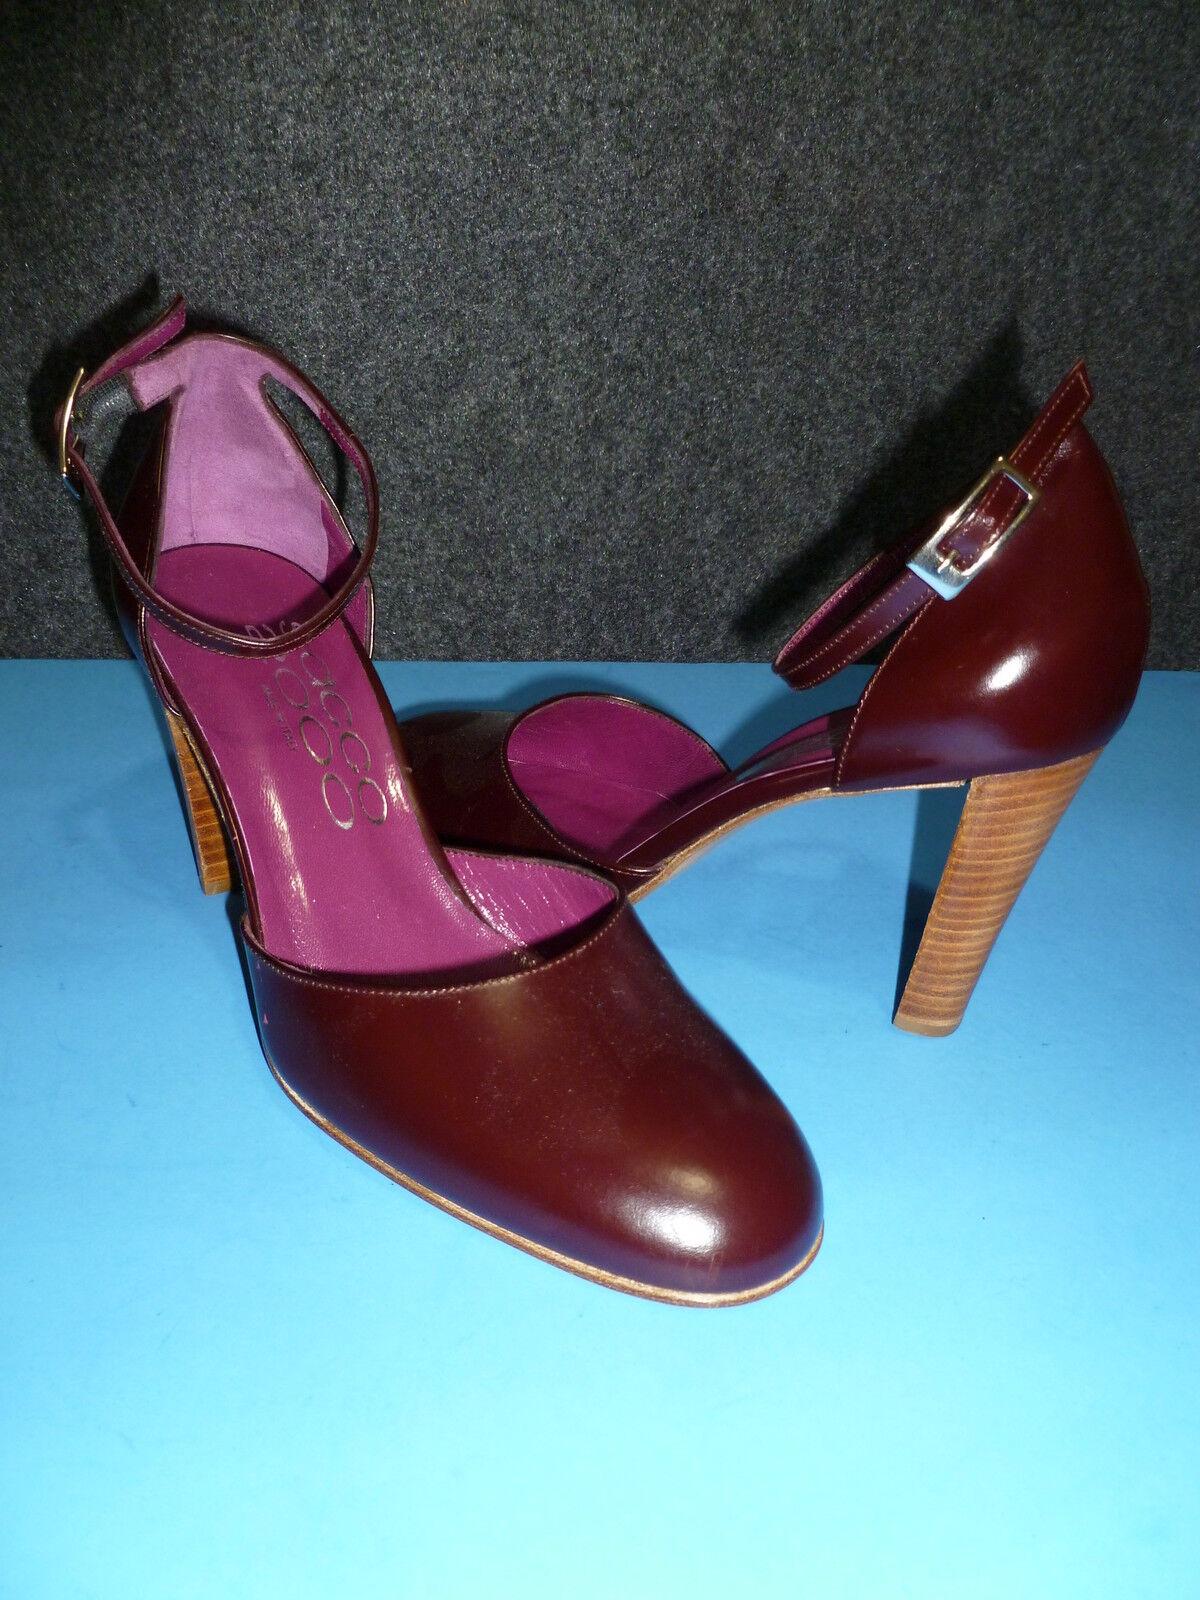 shopping online e negozio di moda SACCO Burgundy Leather Heel Heel Heel Pumps scarpe SZ 37.5 EUR – 7 US  profitto zero